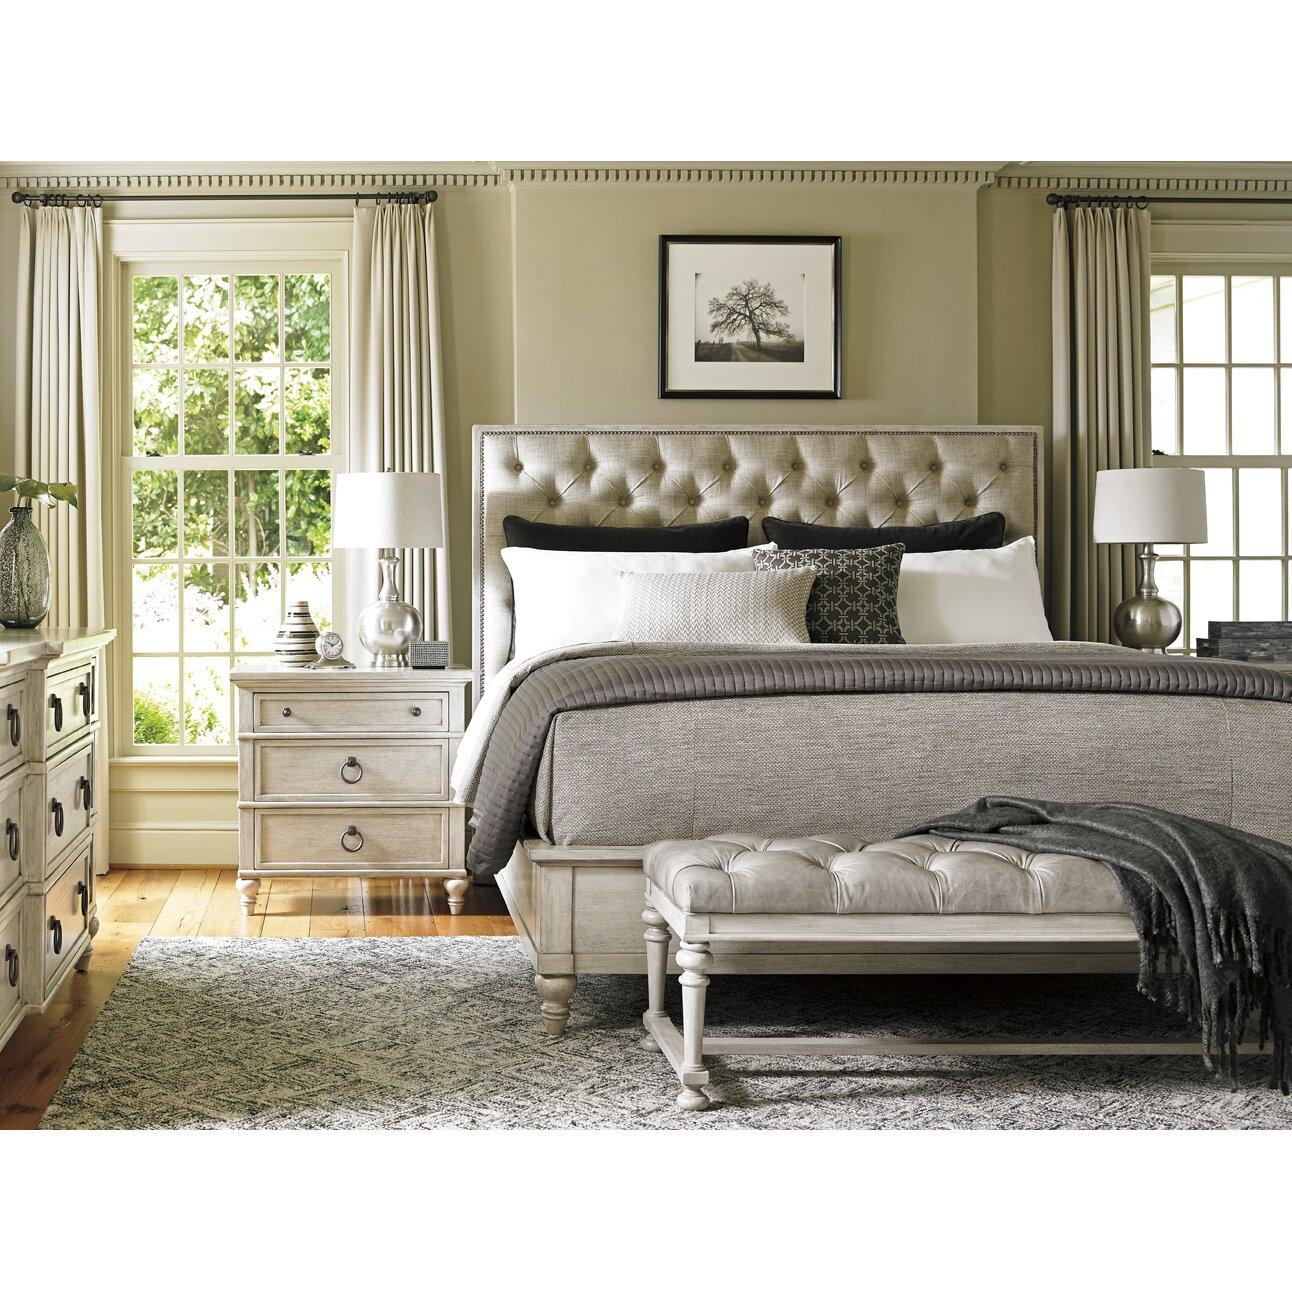 Oyster Bay Bedroom Furniture Lexington Oyster Bay Upholstery Platform Customizable Bedroom Set